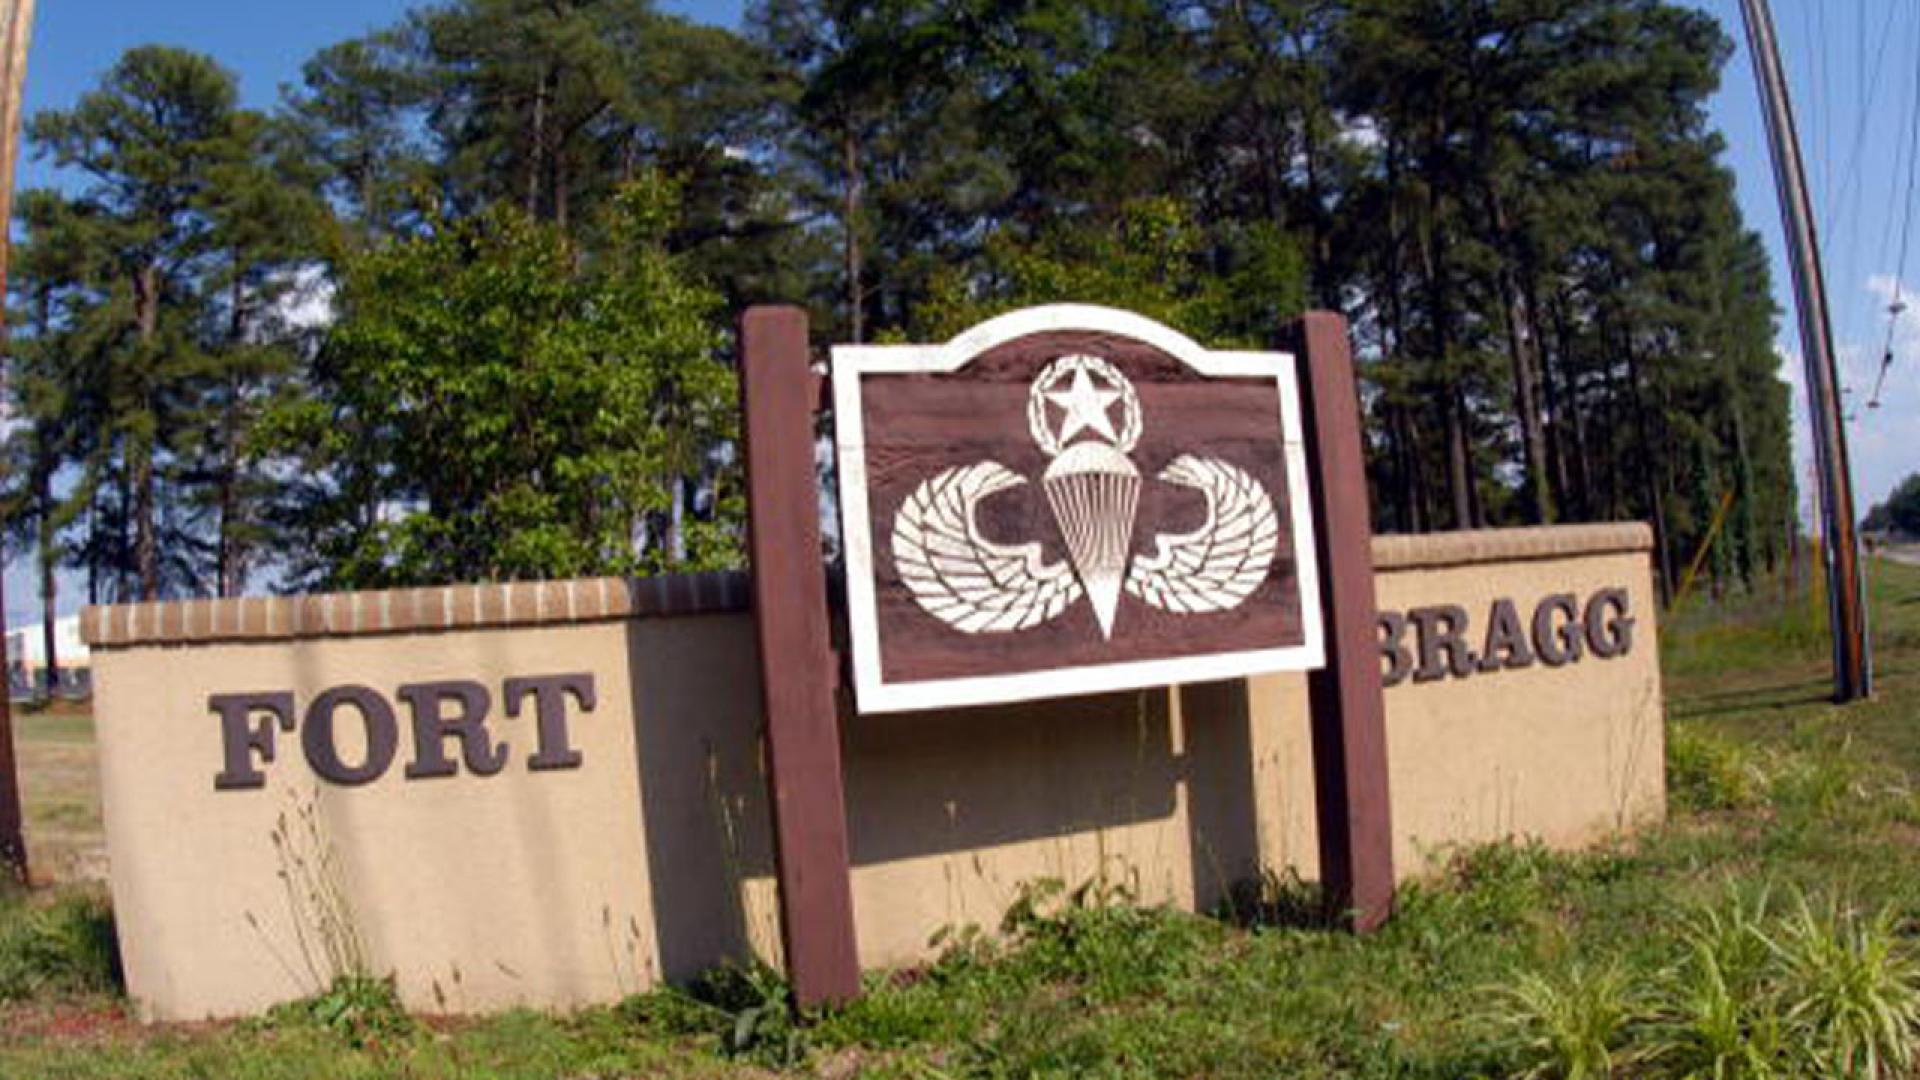 Fort Bragg Army Base, North Carolina